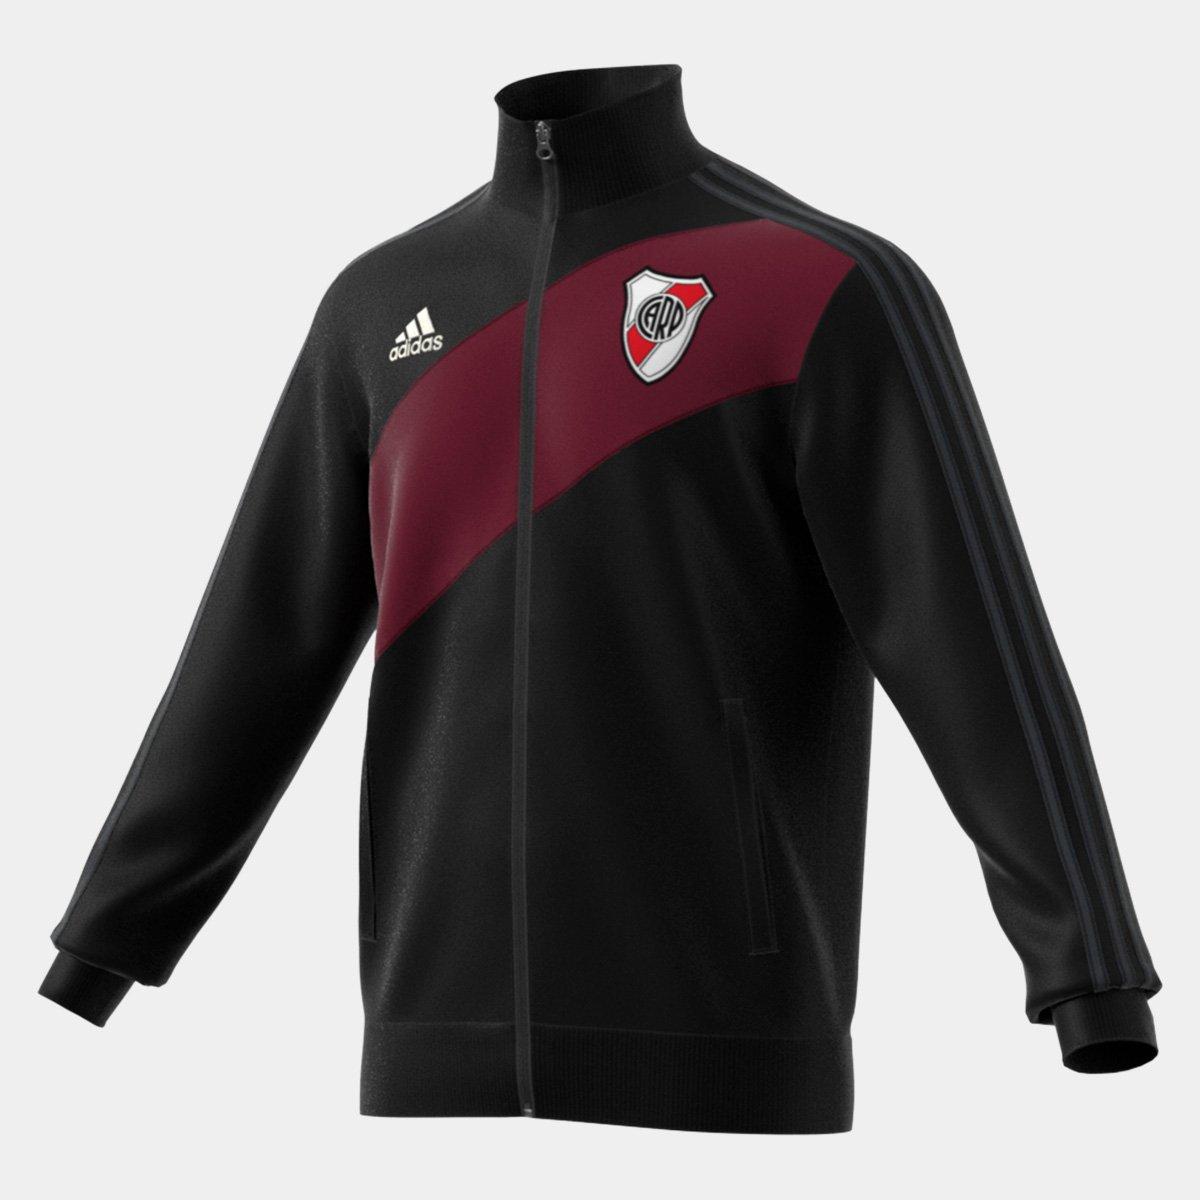 Jaqueta River Plate Adidas 3-Stripes Track Top Masculina